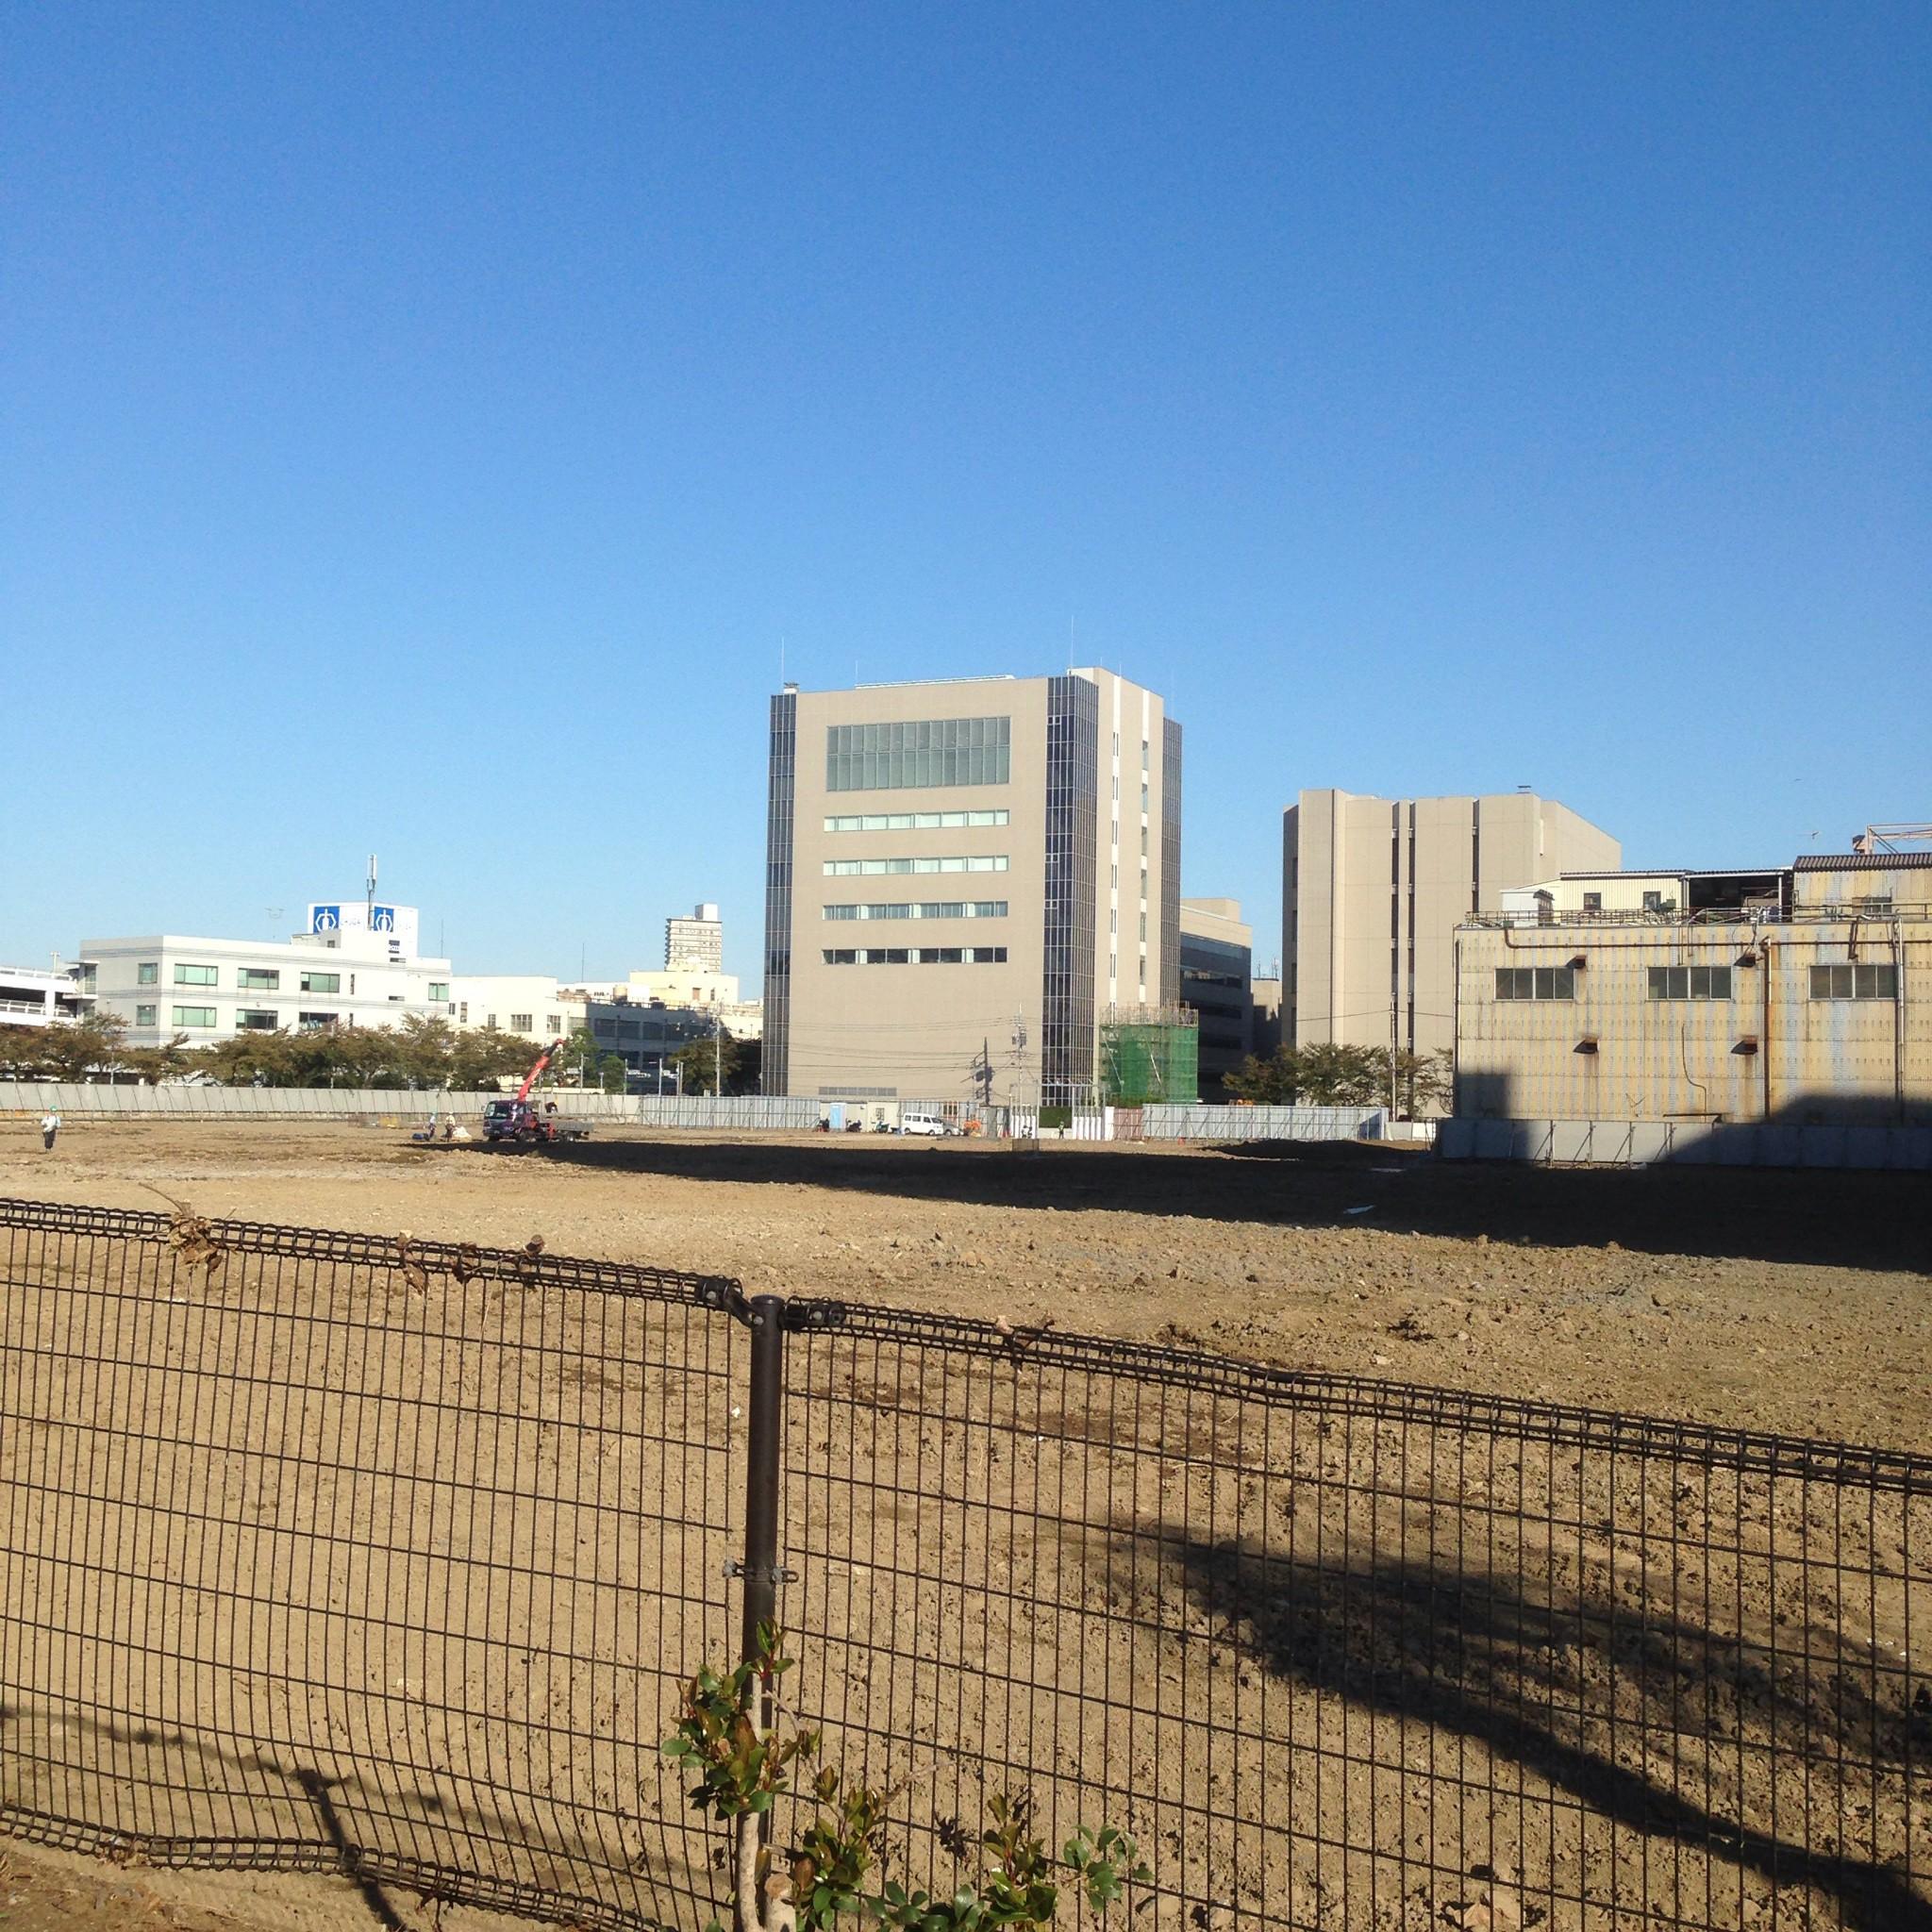 [PH] #キクチカラー浮間工場跡地, October 29, 2014